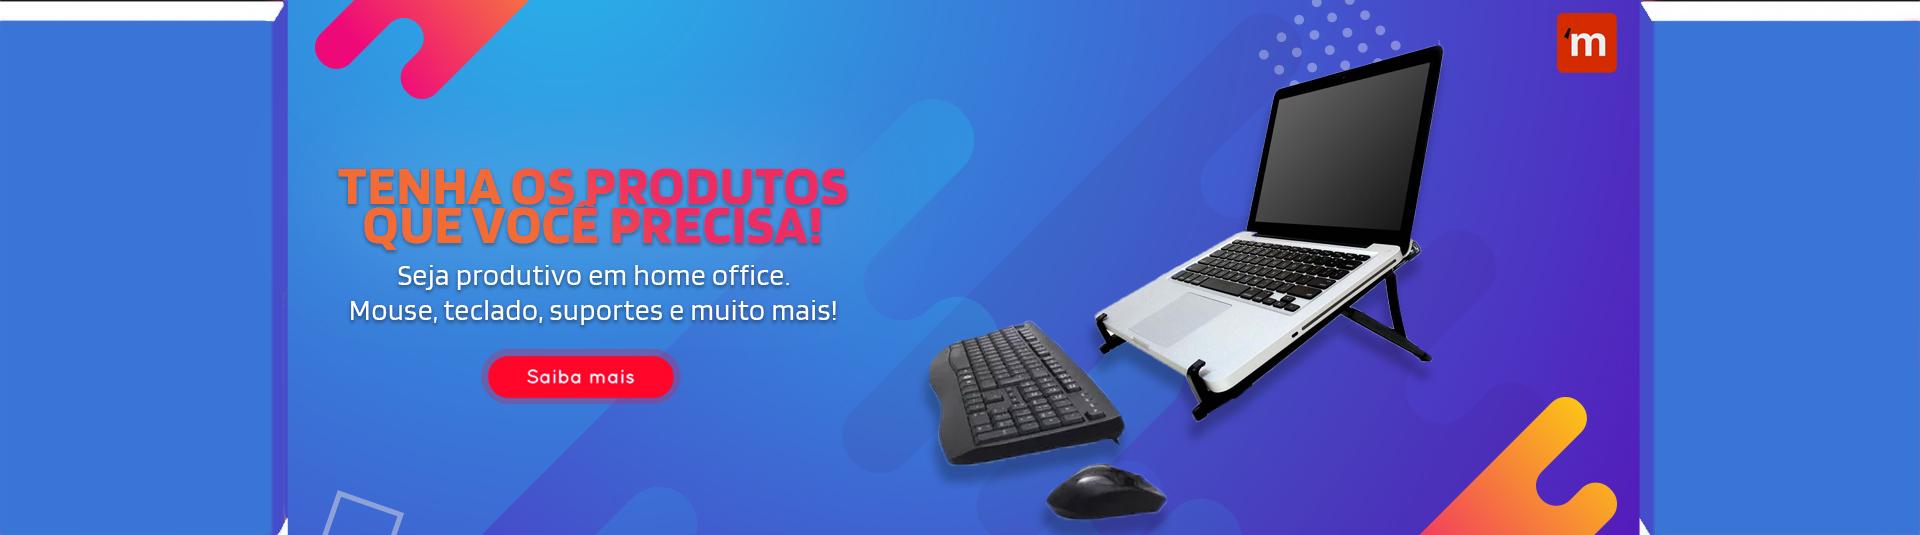 mouse suporte cooler webcam teclado